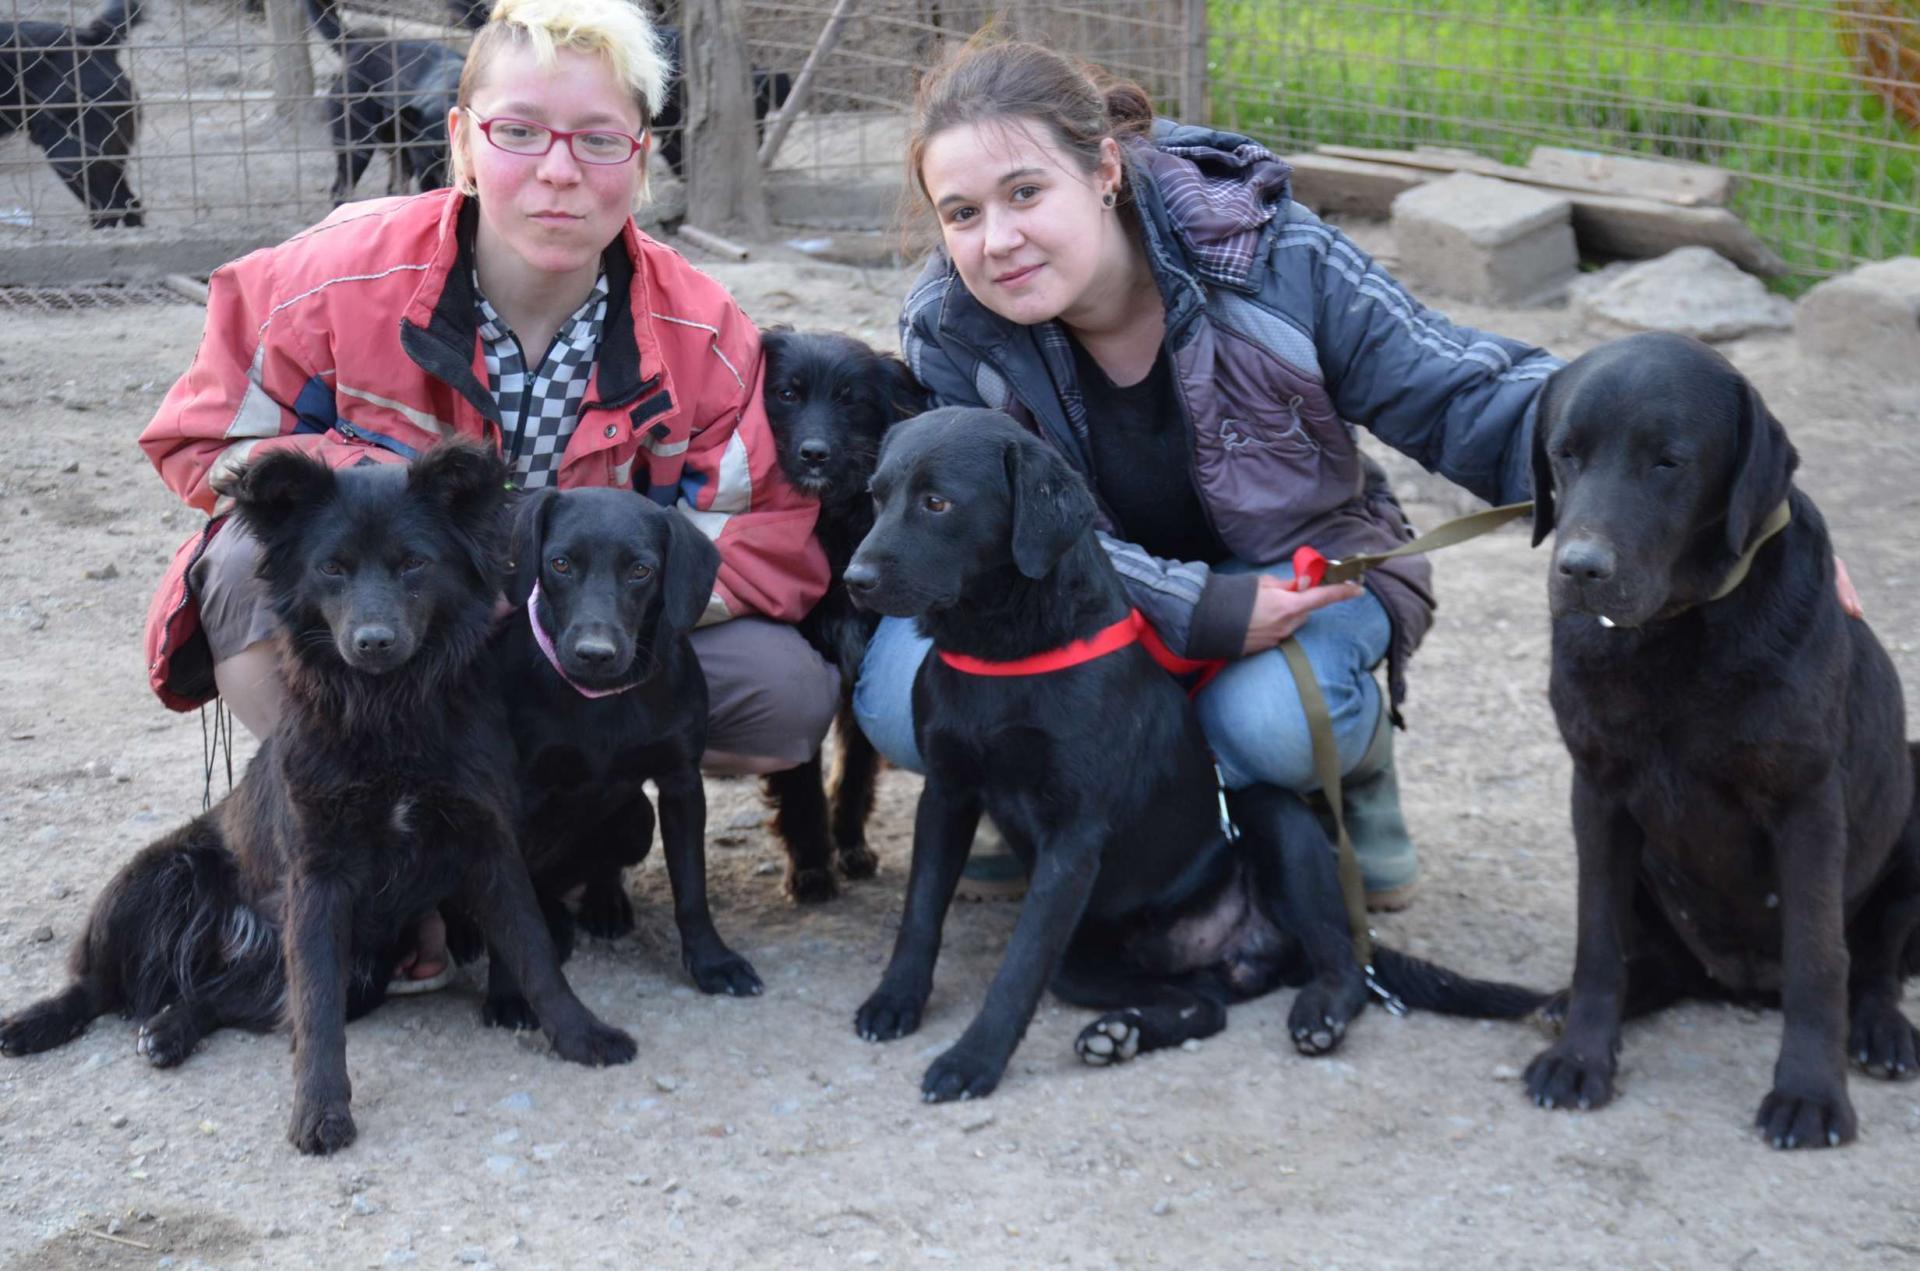 Black dogs 11 b